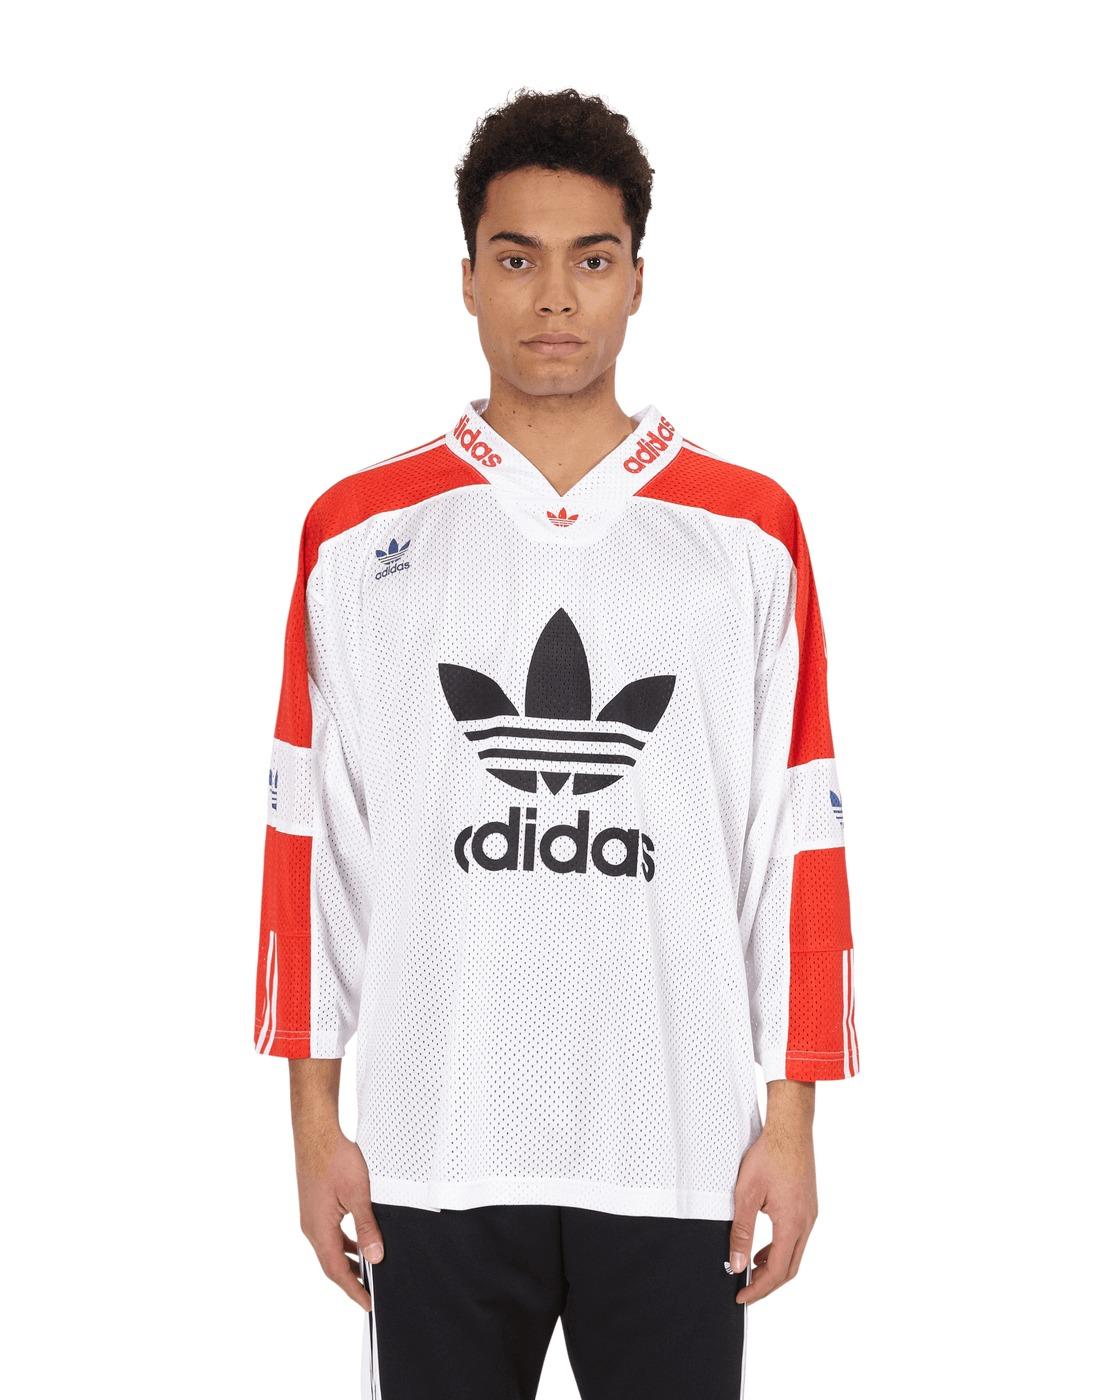 Adidas Originals Blueliner Trefoil Jersey White/Active Red